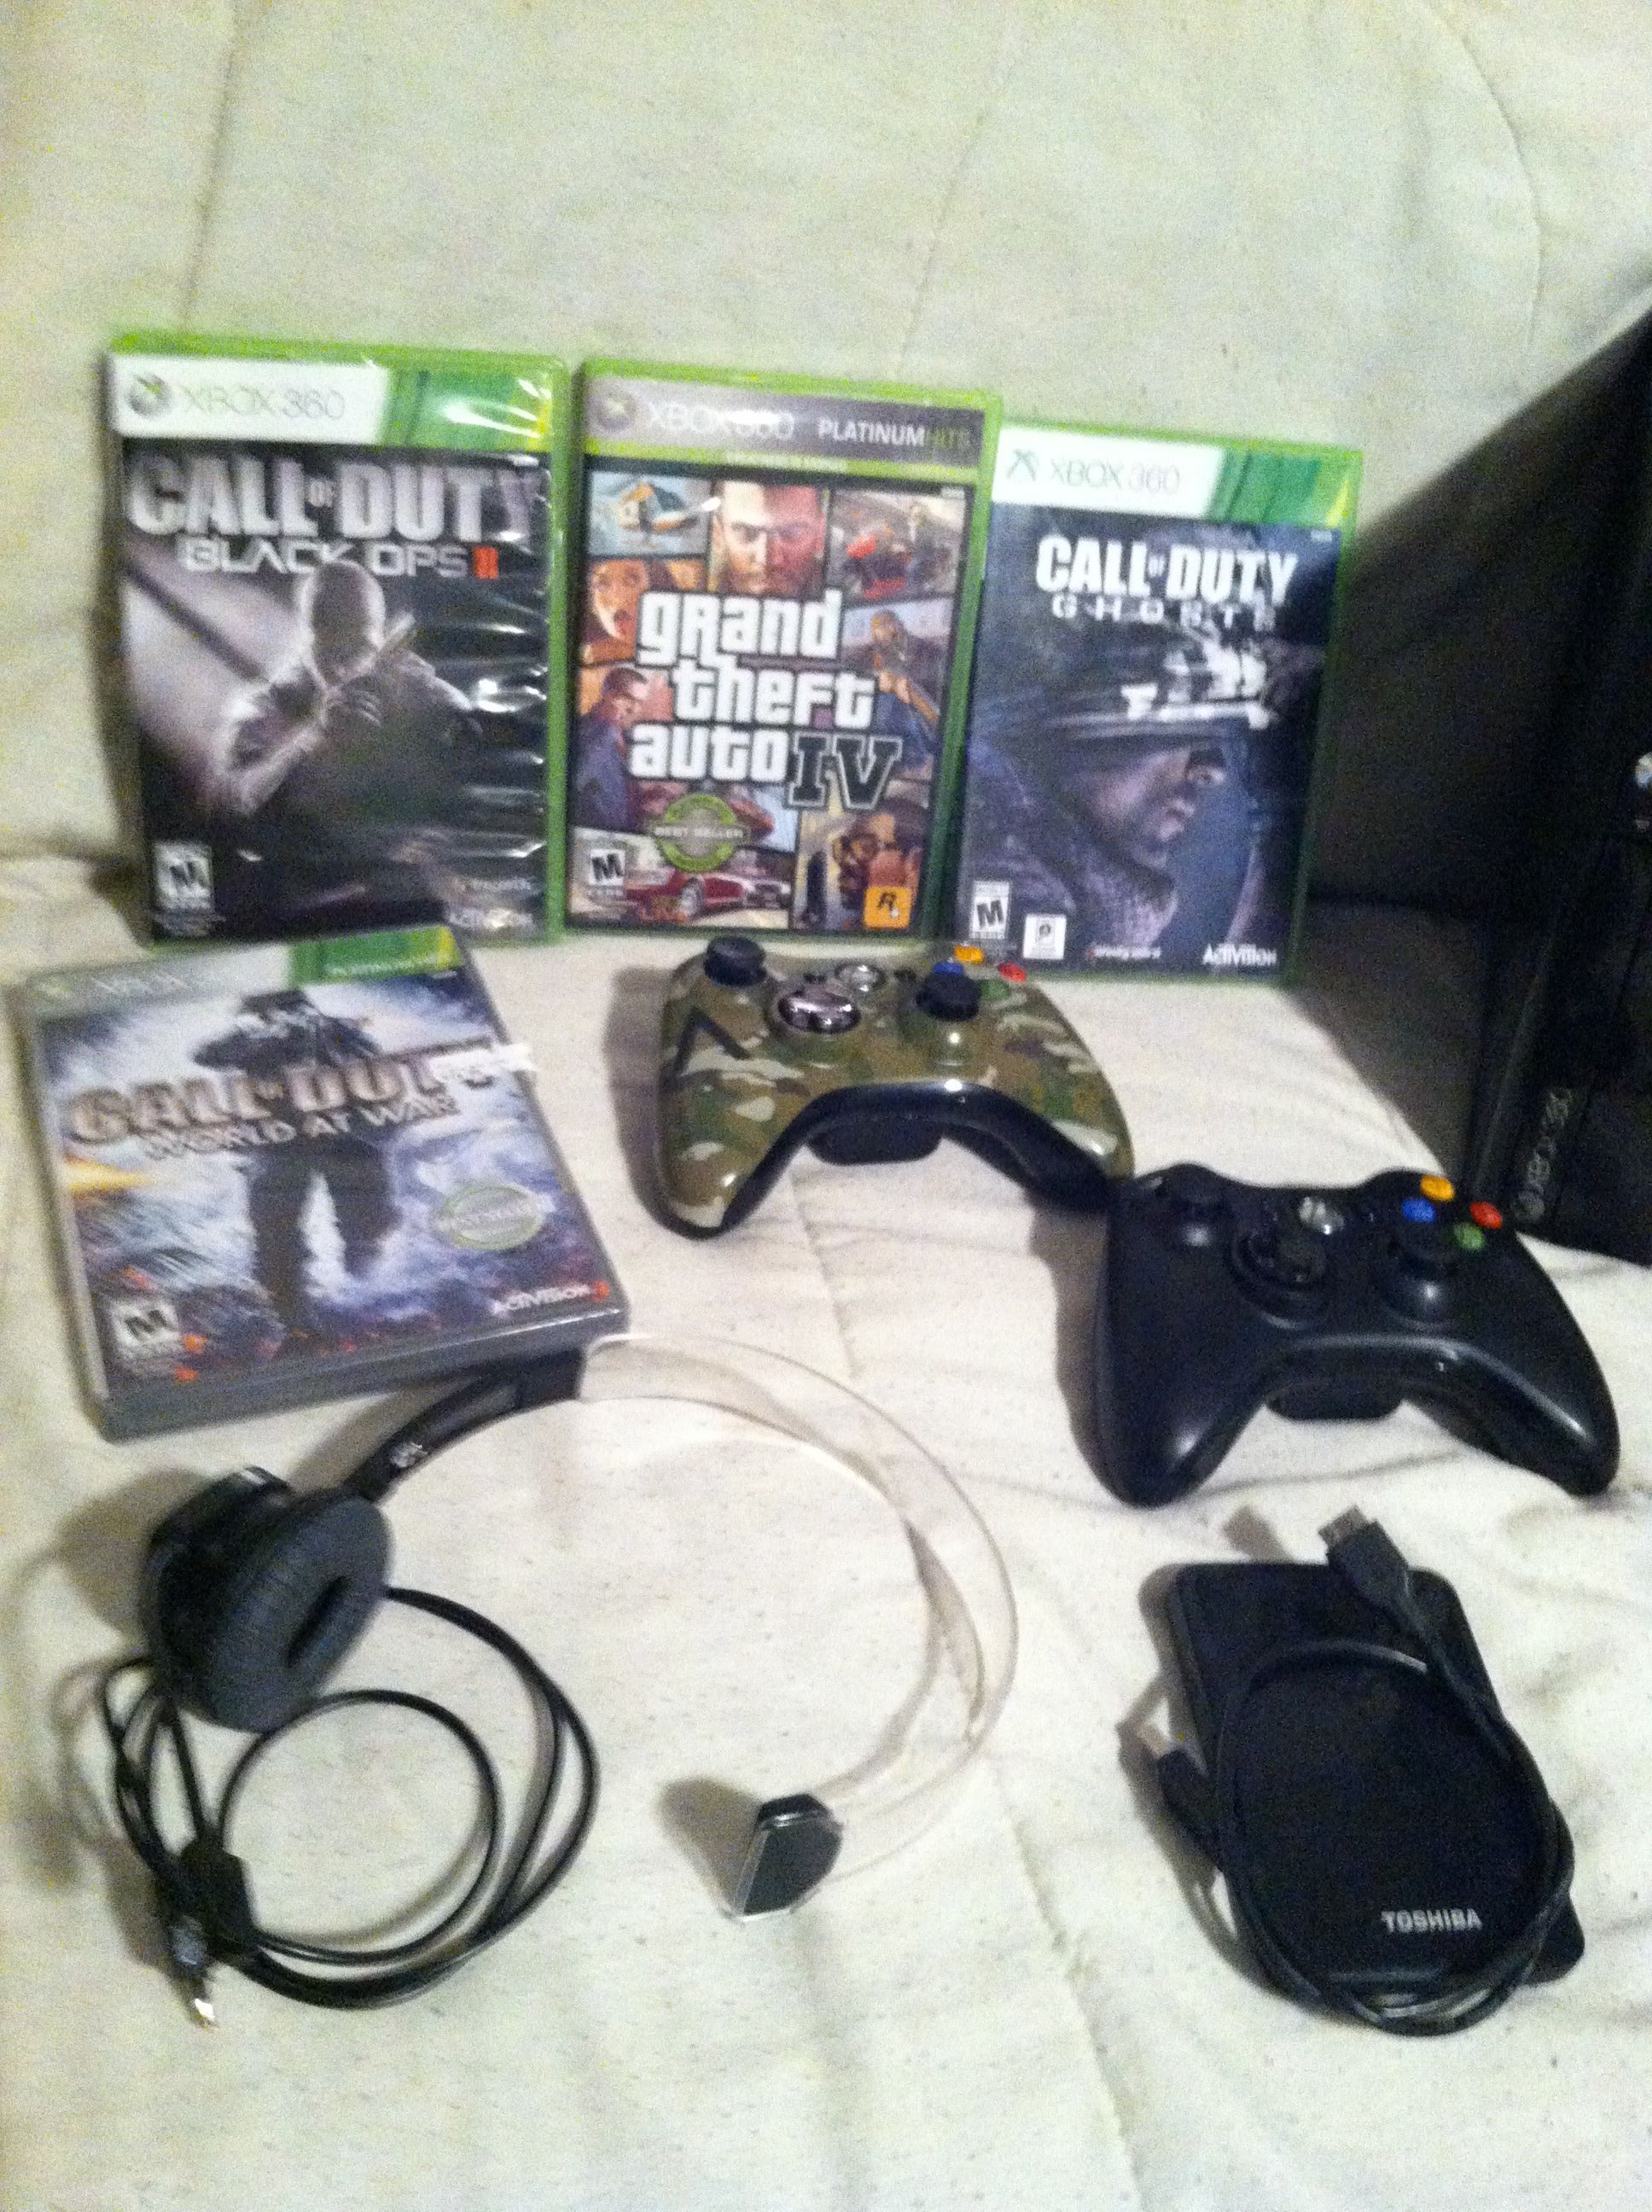 Xbox 360 Elite In Ron Sale S Garage Sale Angola In Garage Sale